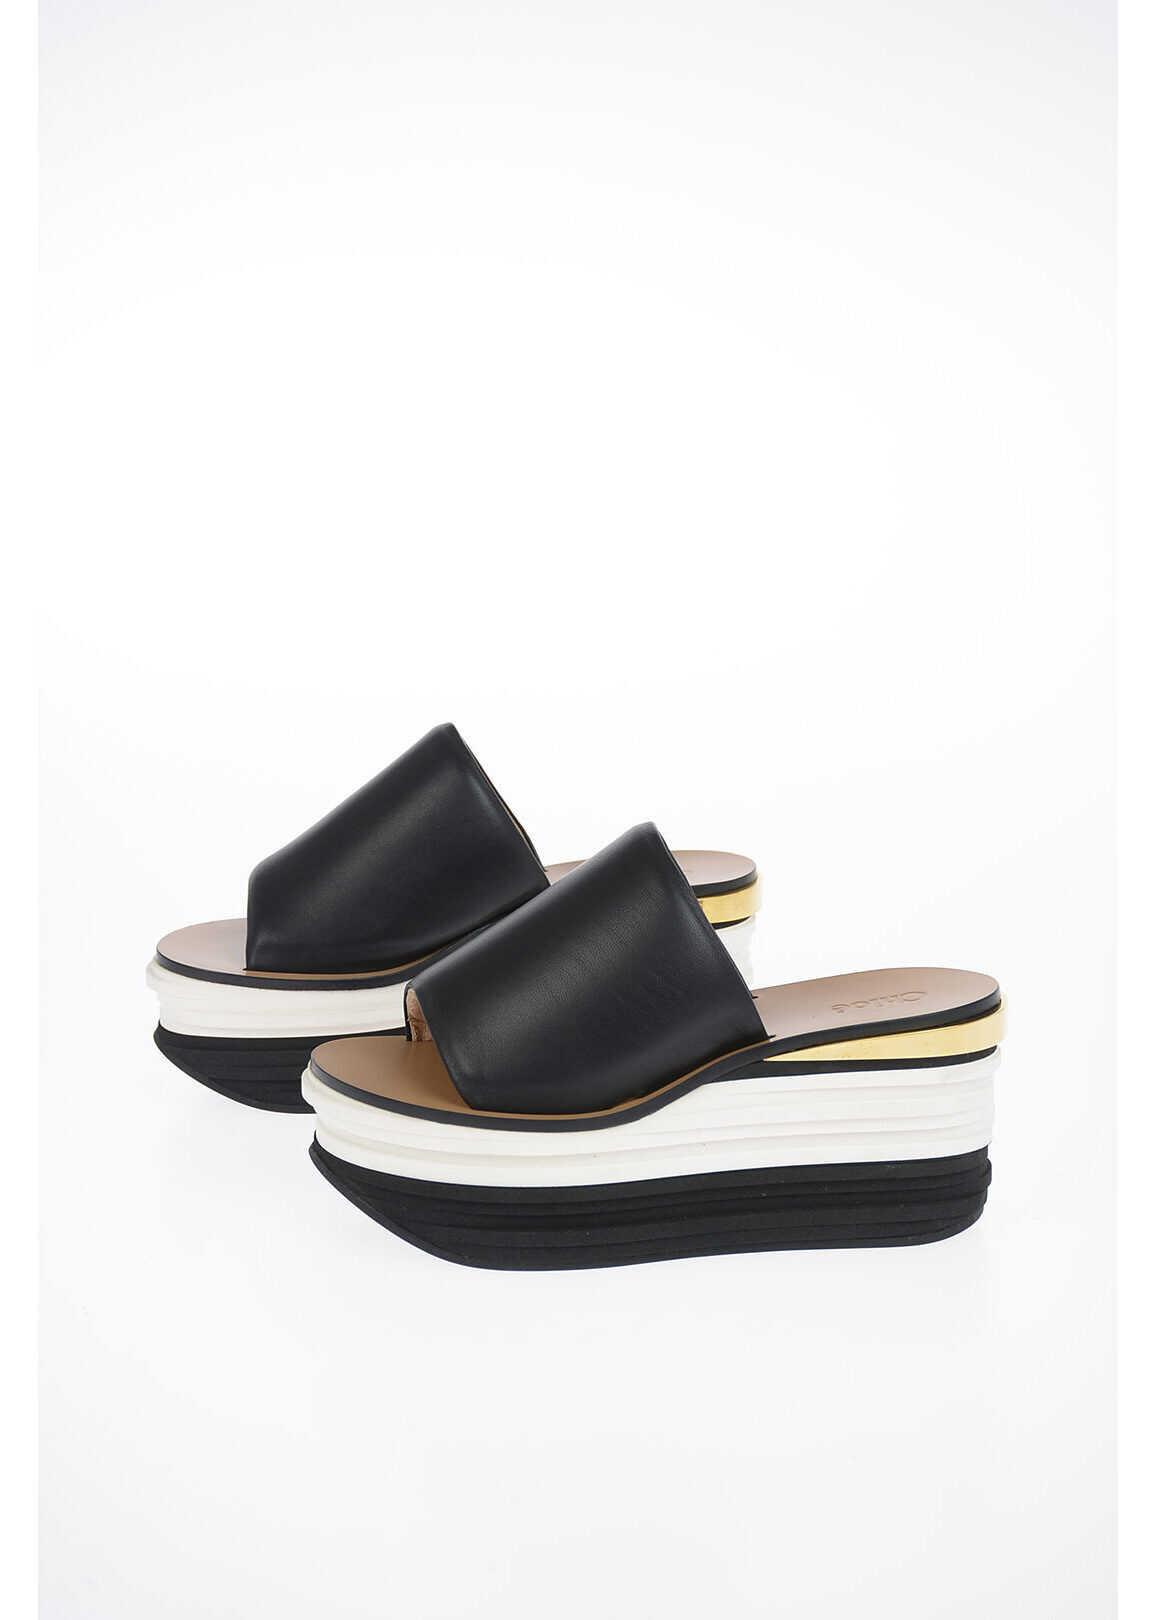 Chloe 7cm Leather Sandal with Wedge BLACK